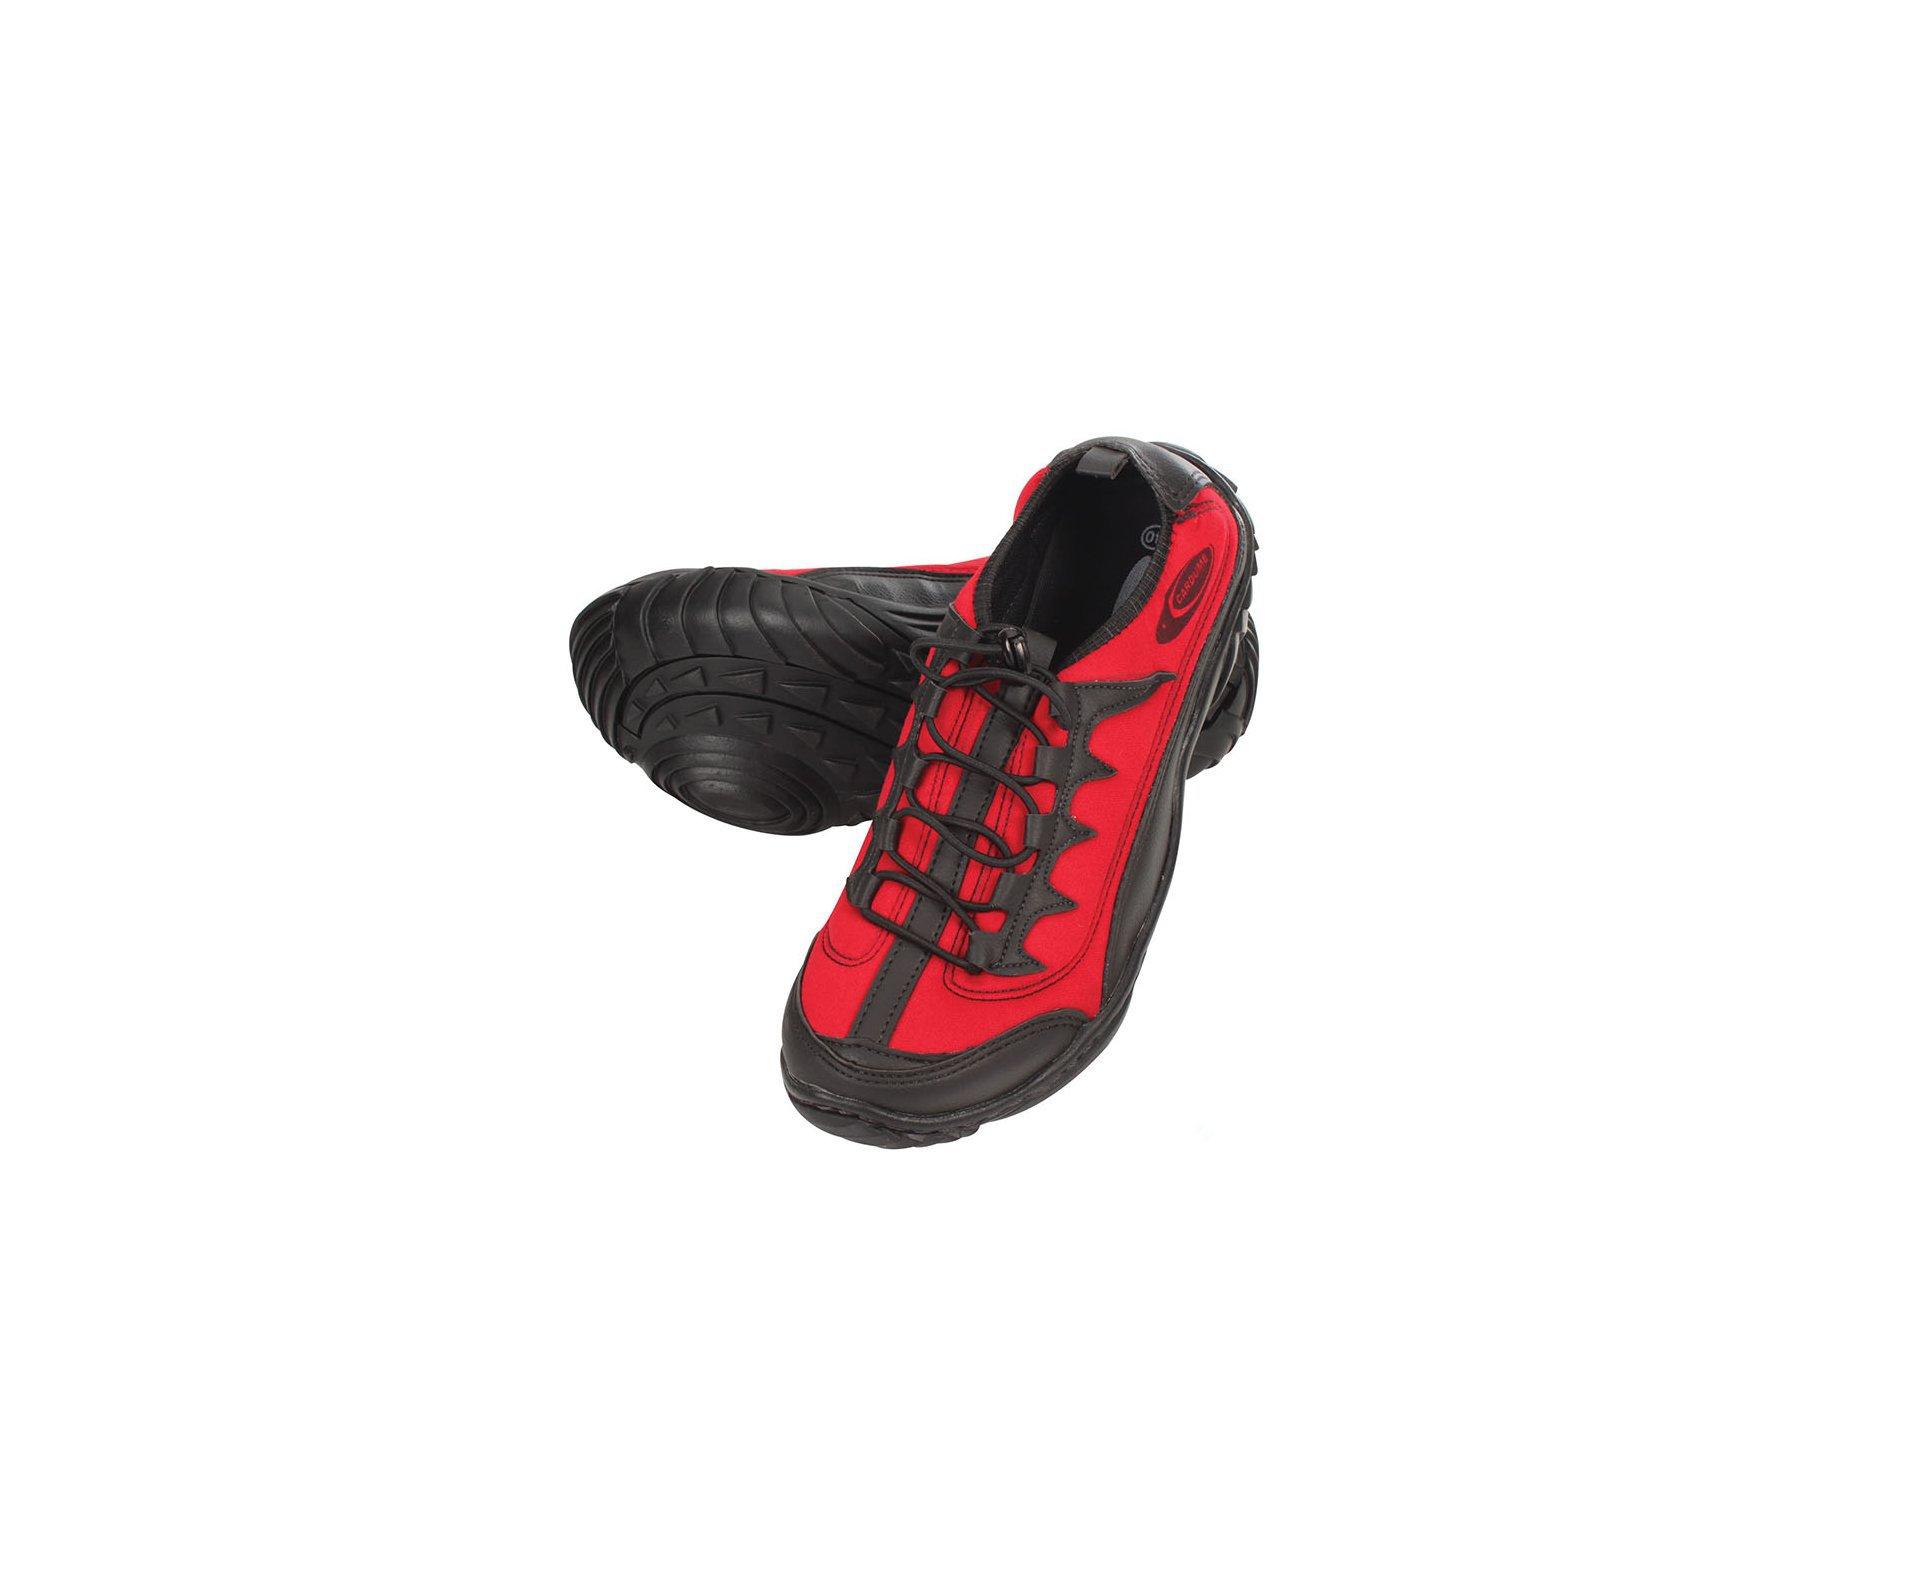 Tenis Anfibius Vermelho - Cardume